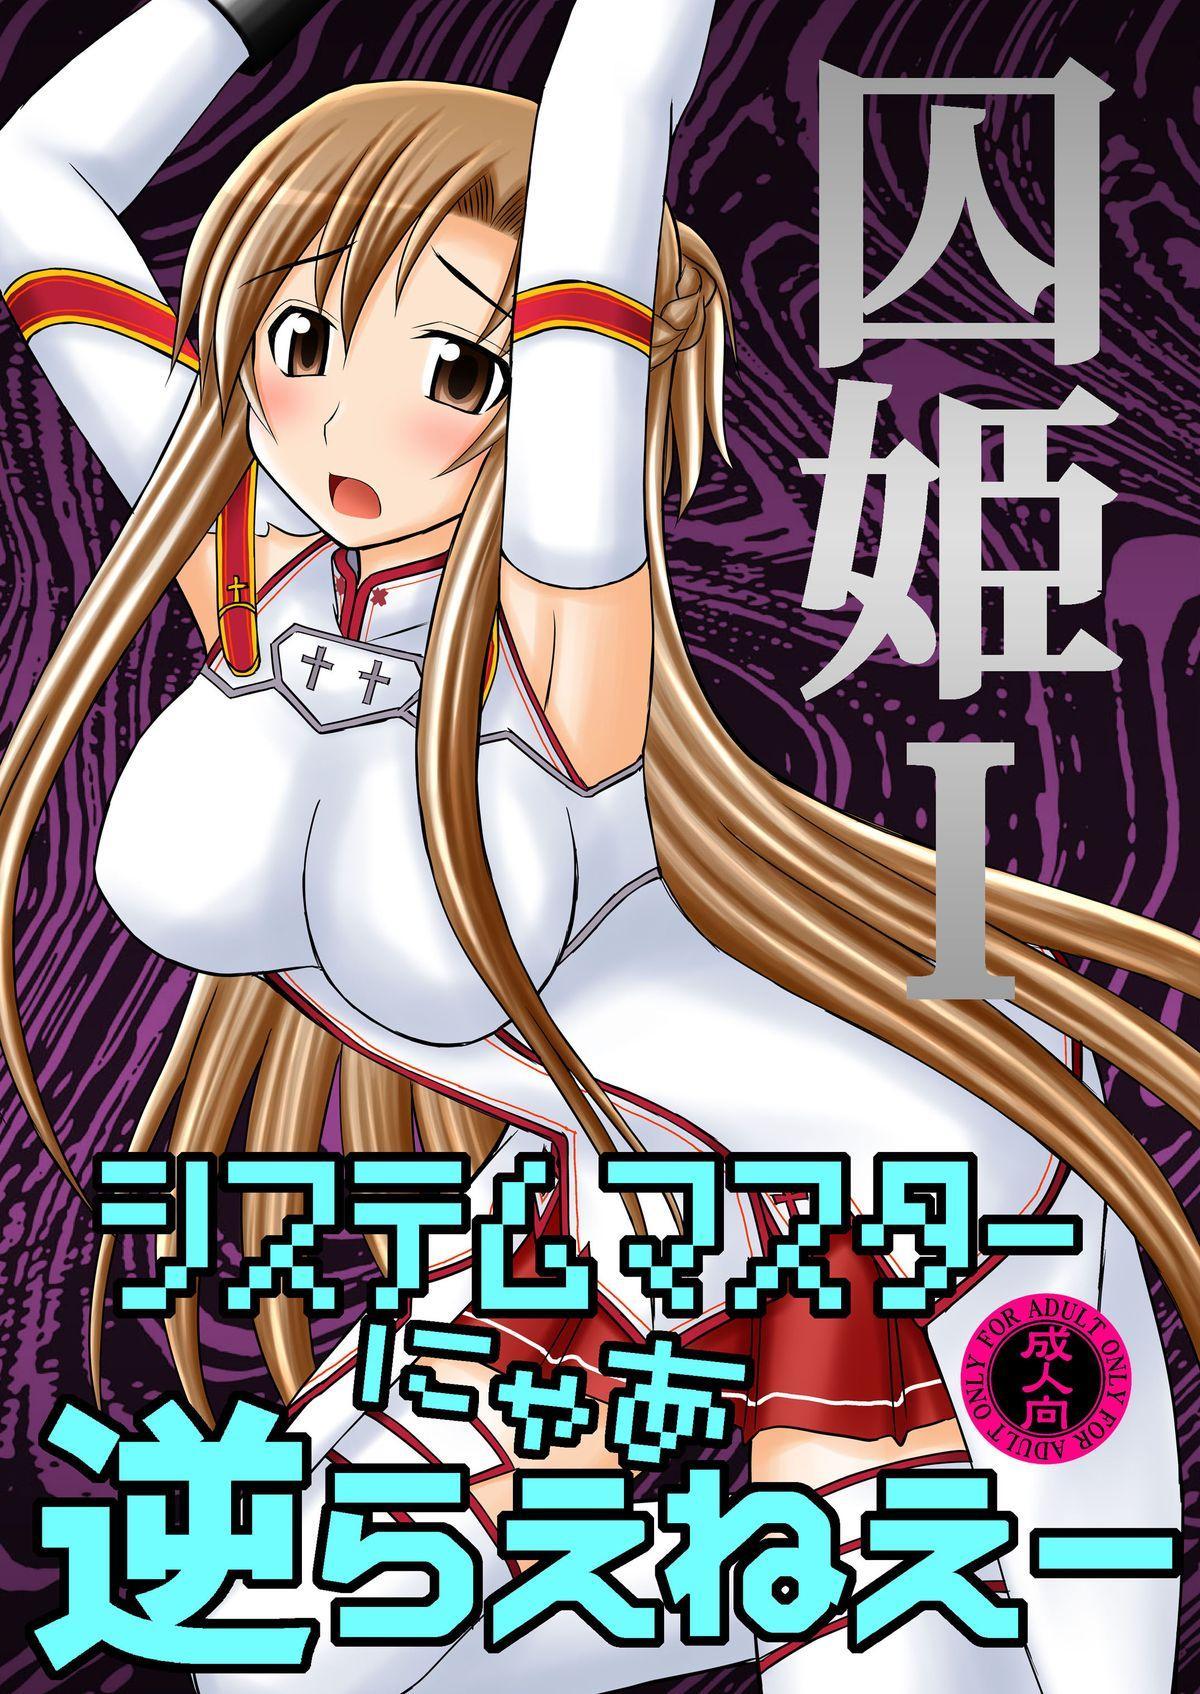 Toraware Hime I - System Master Nyaa Sakarae nee 0